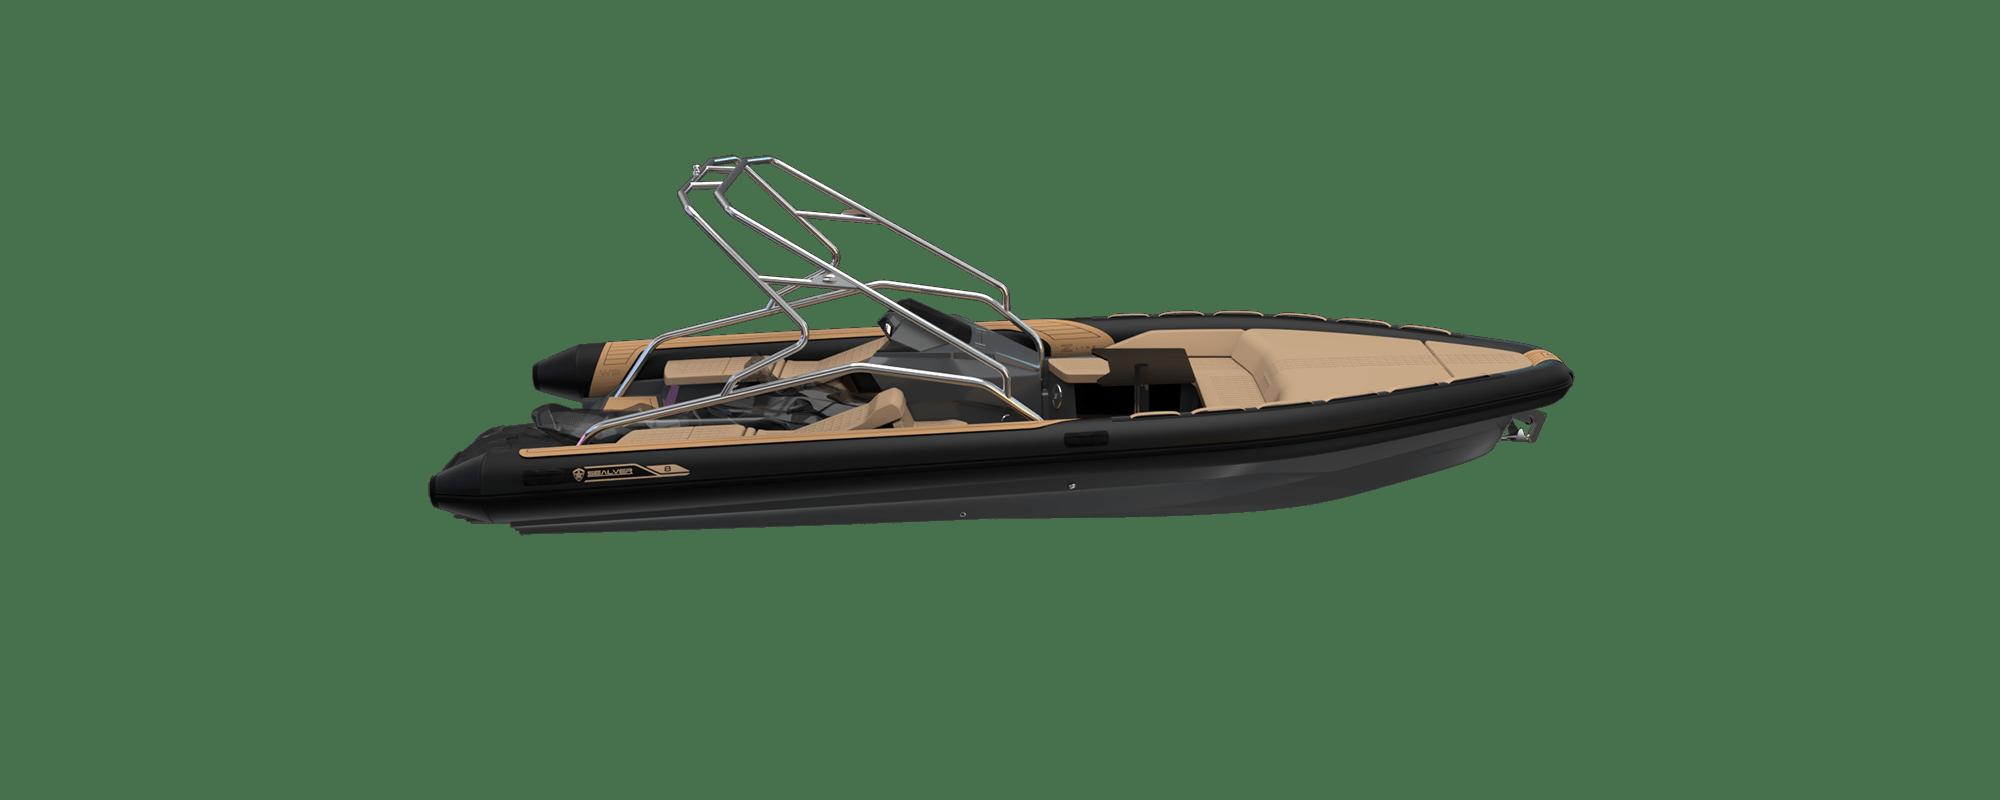 Premium waveboat ZLINE Z8 HEVO Jetski